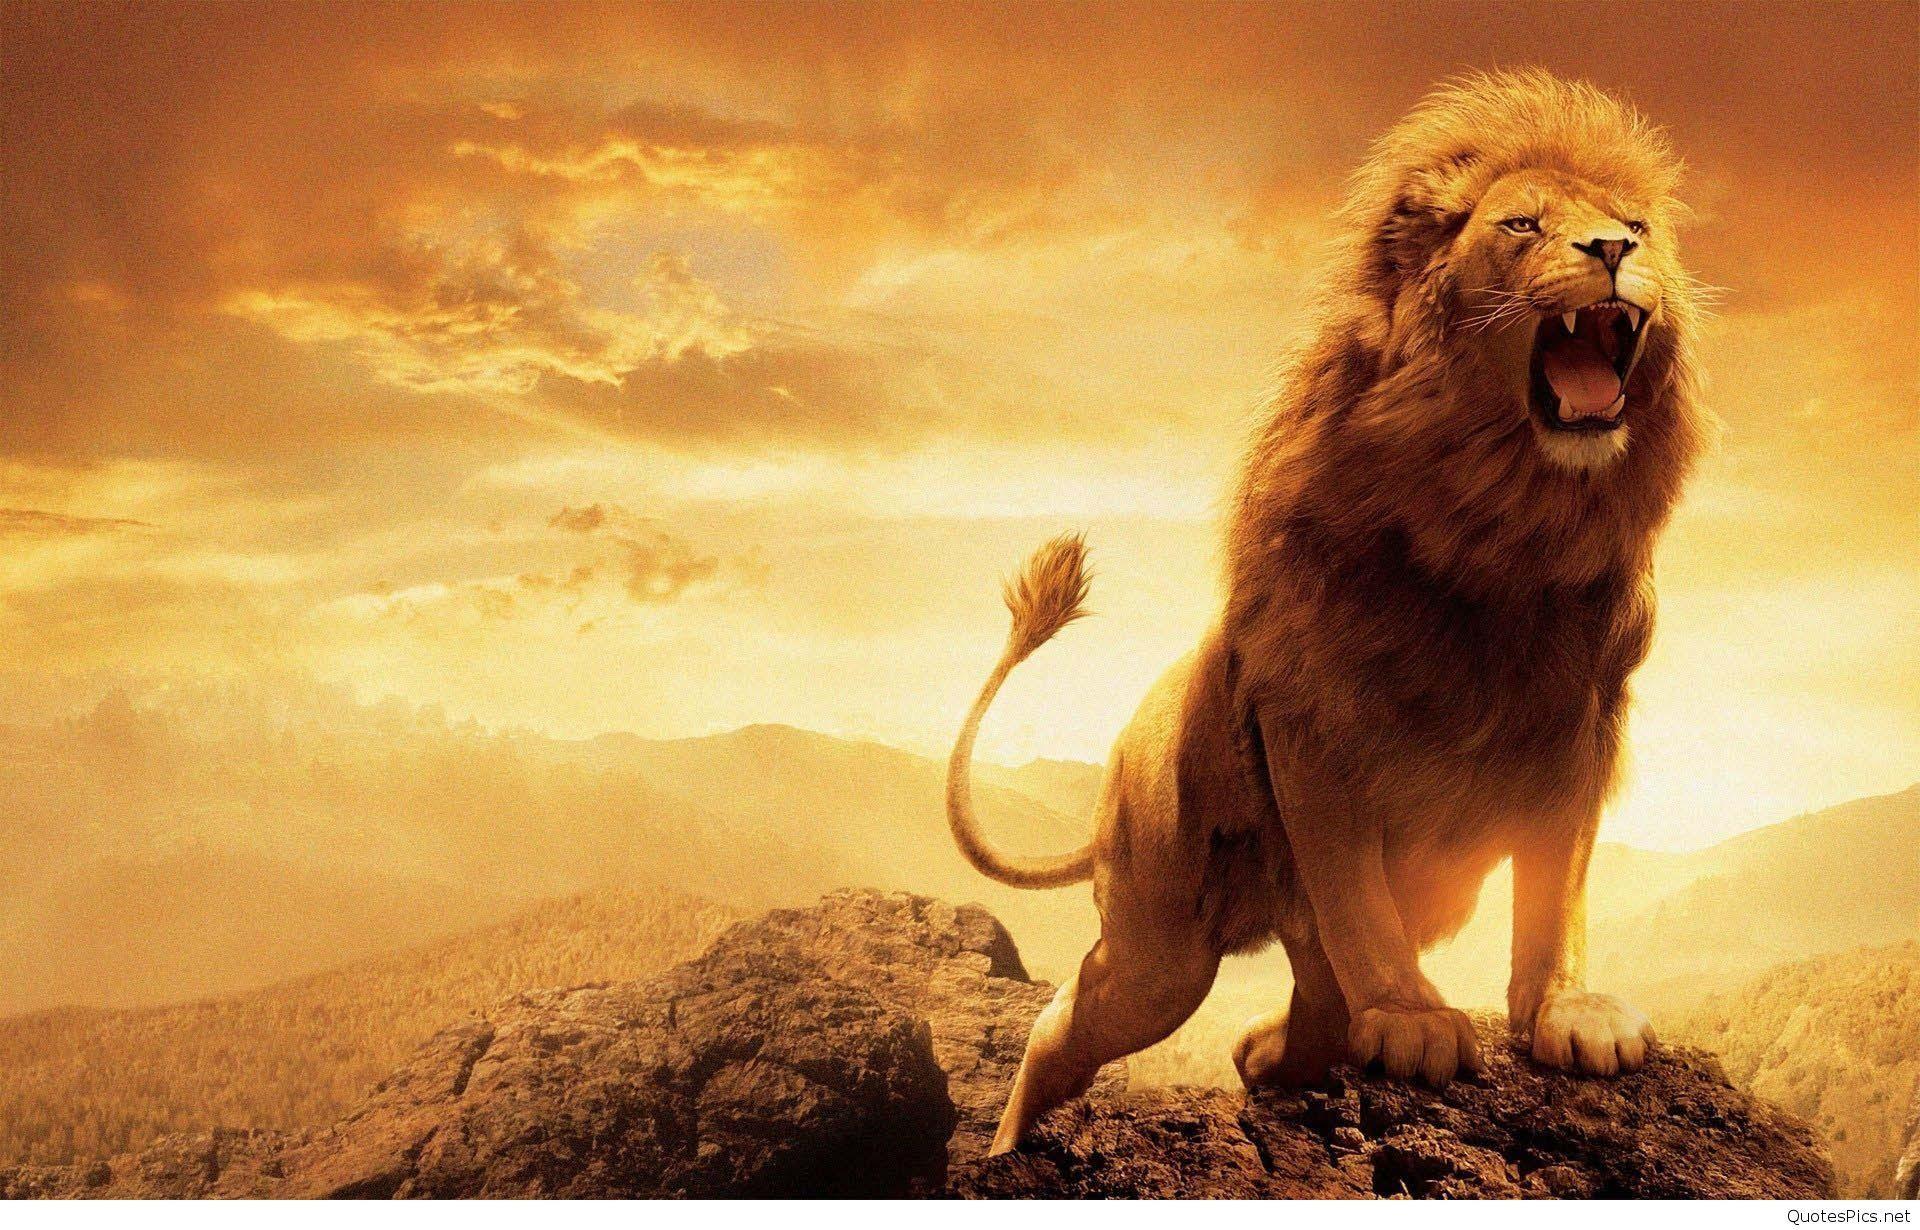 roaring lion wallpaper hd 1080p 1920x1230 wallpaper teahub io roaring lion wallpaper hd 1080p